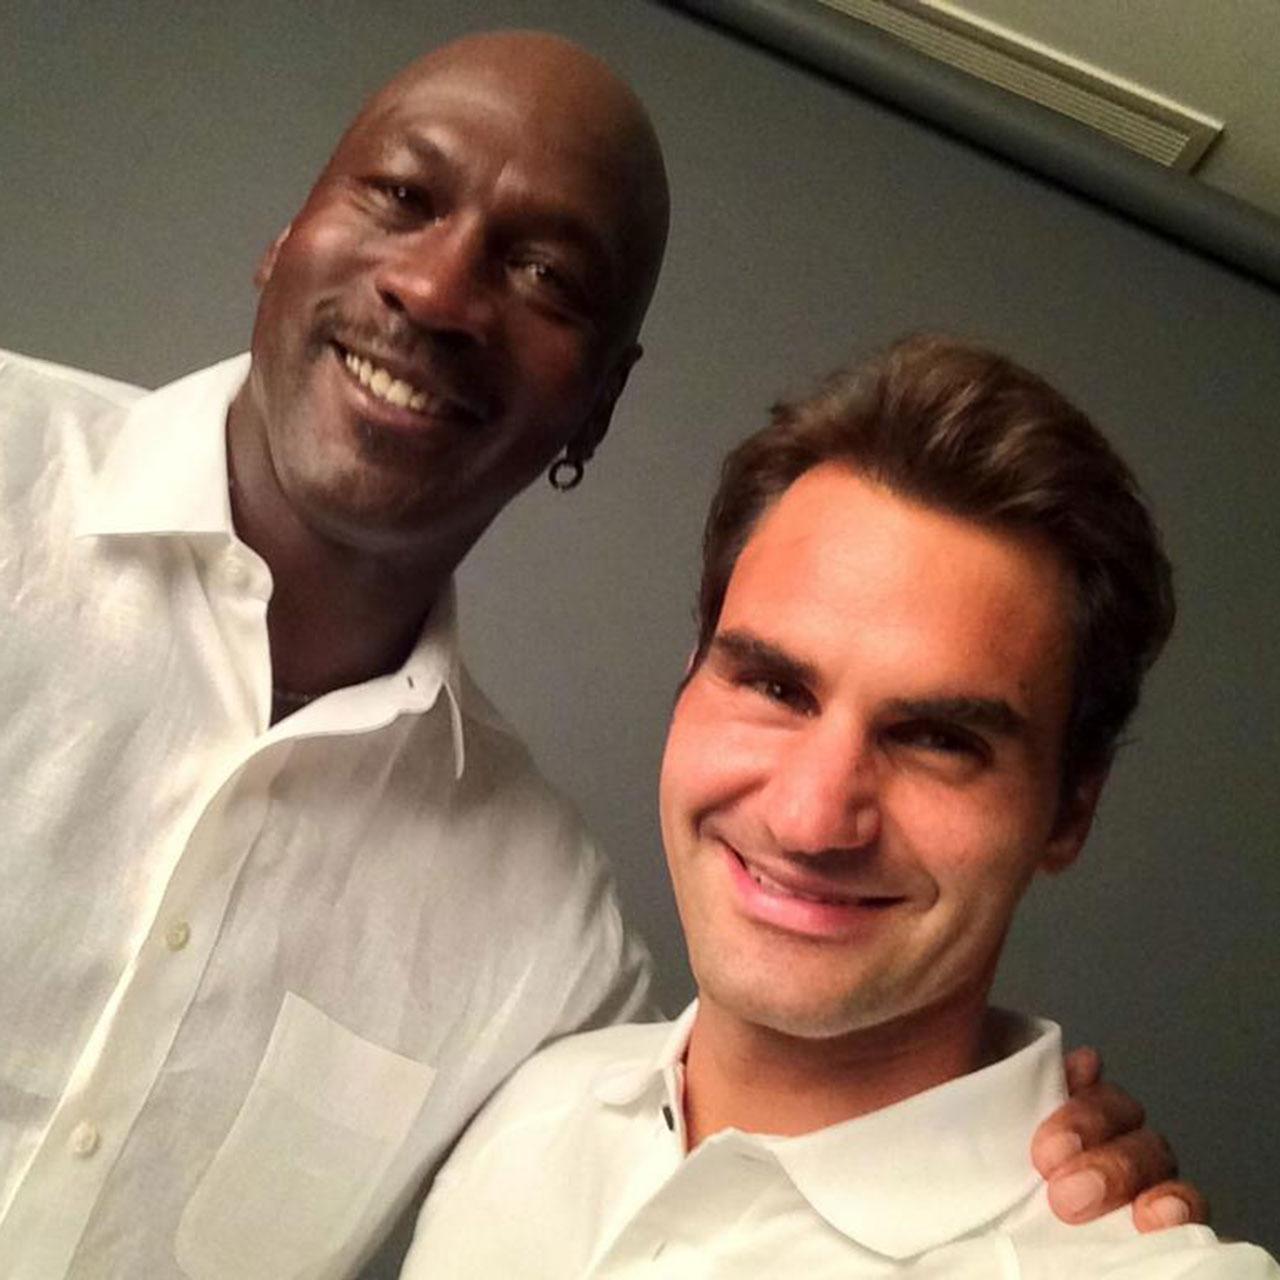 Roger Federer selfie with Michael Jordan